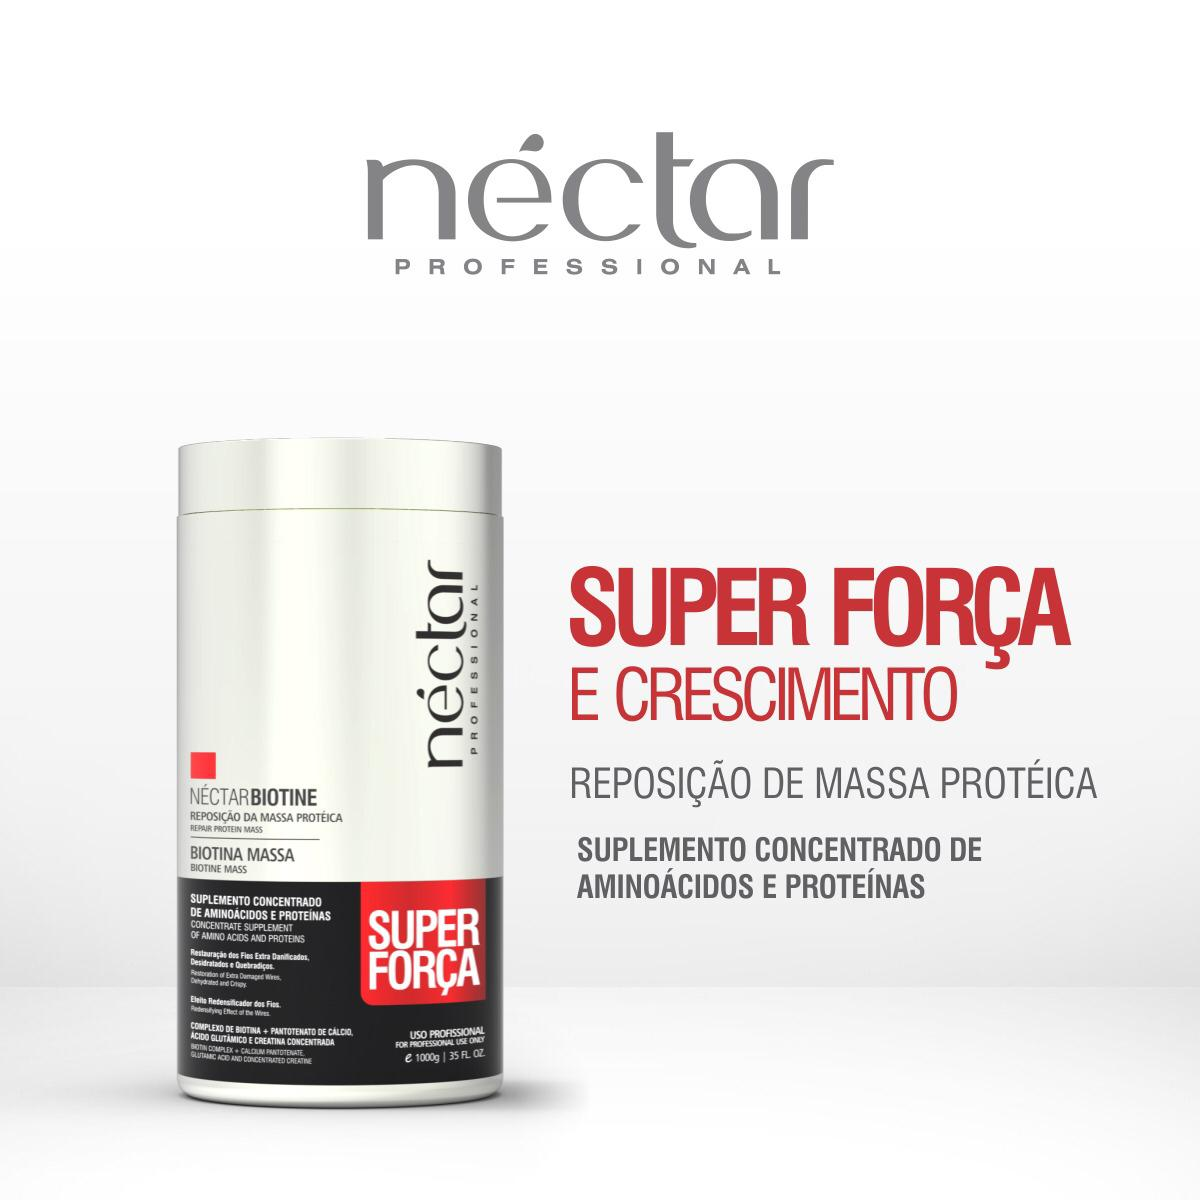 Super Força Néctar Biotine  - Professional 1kg